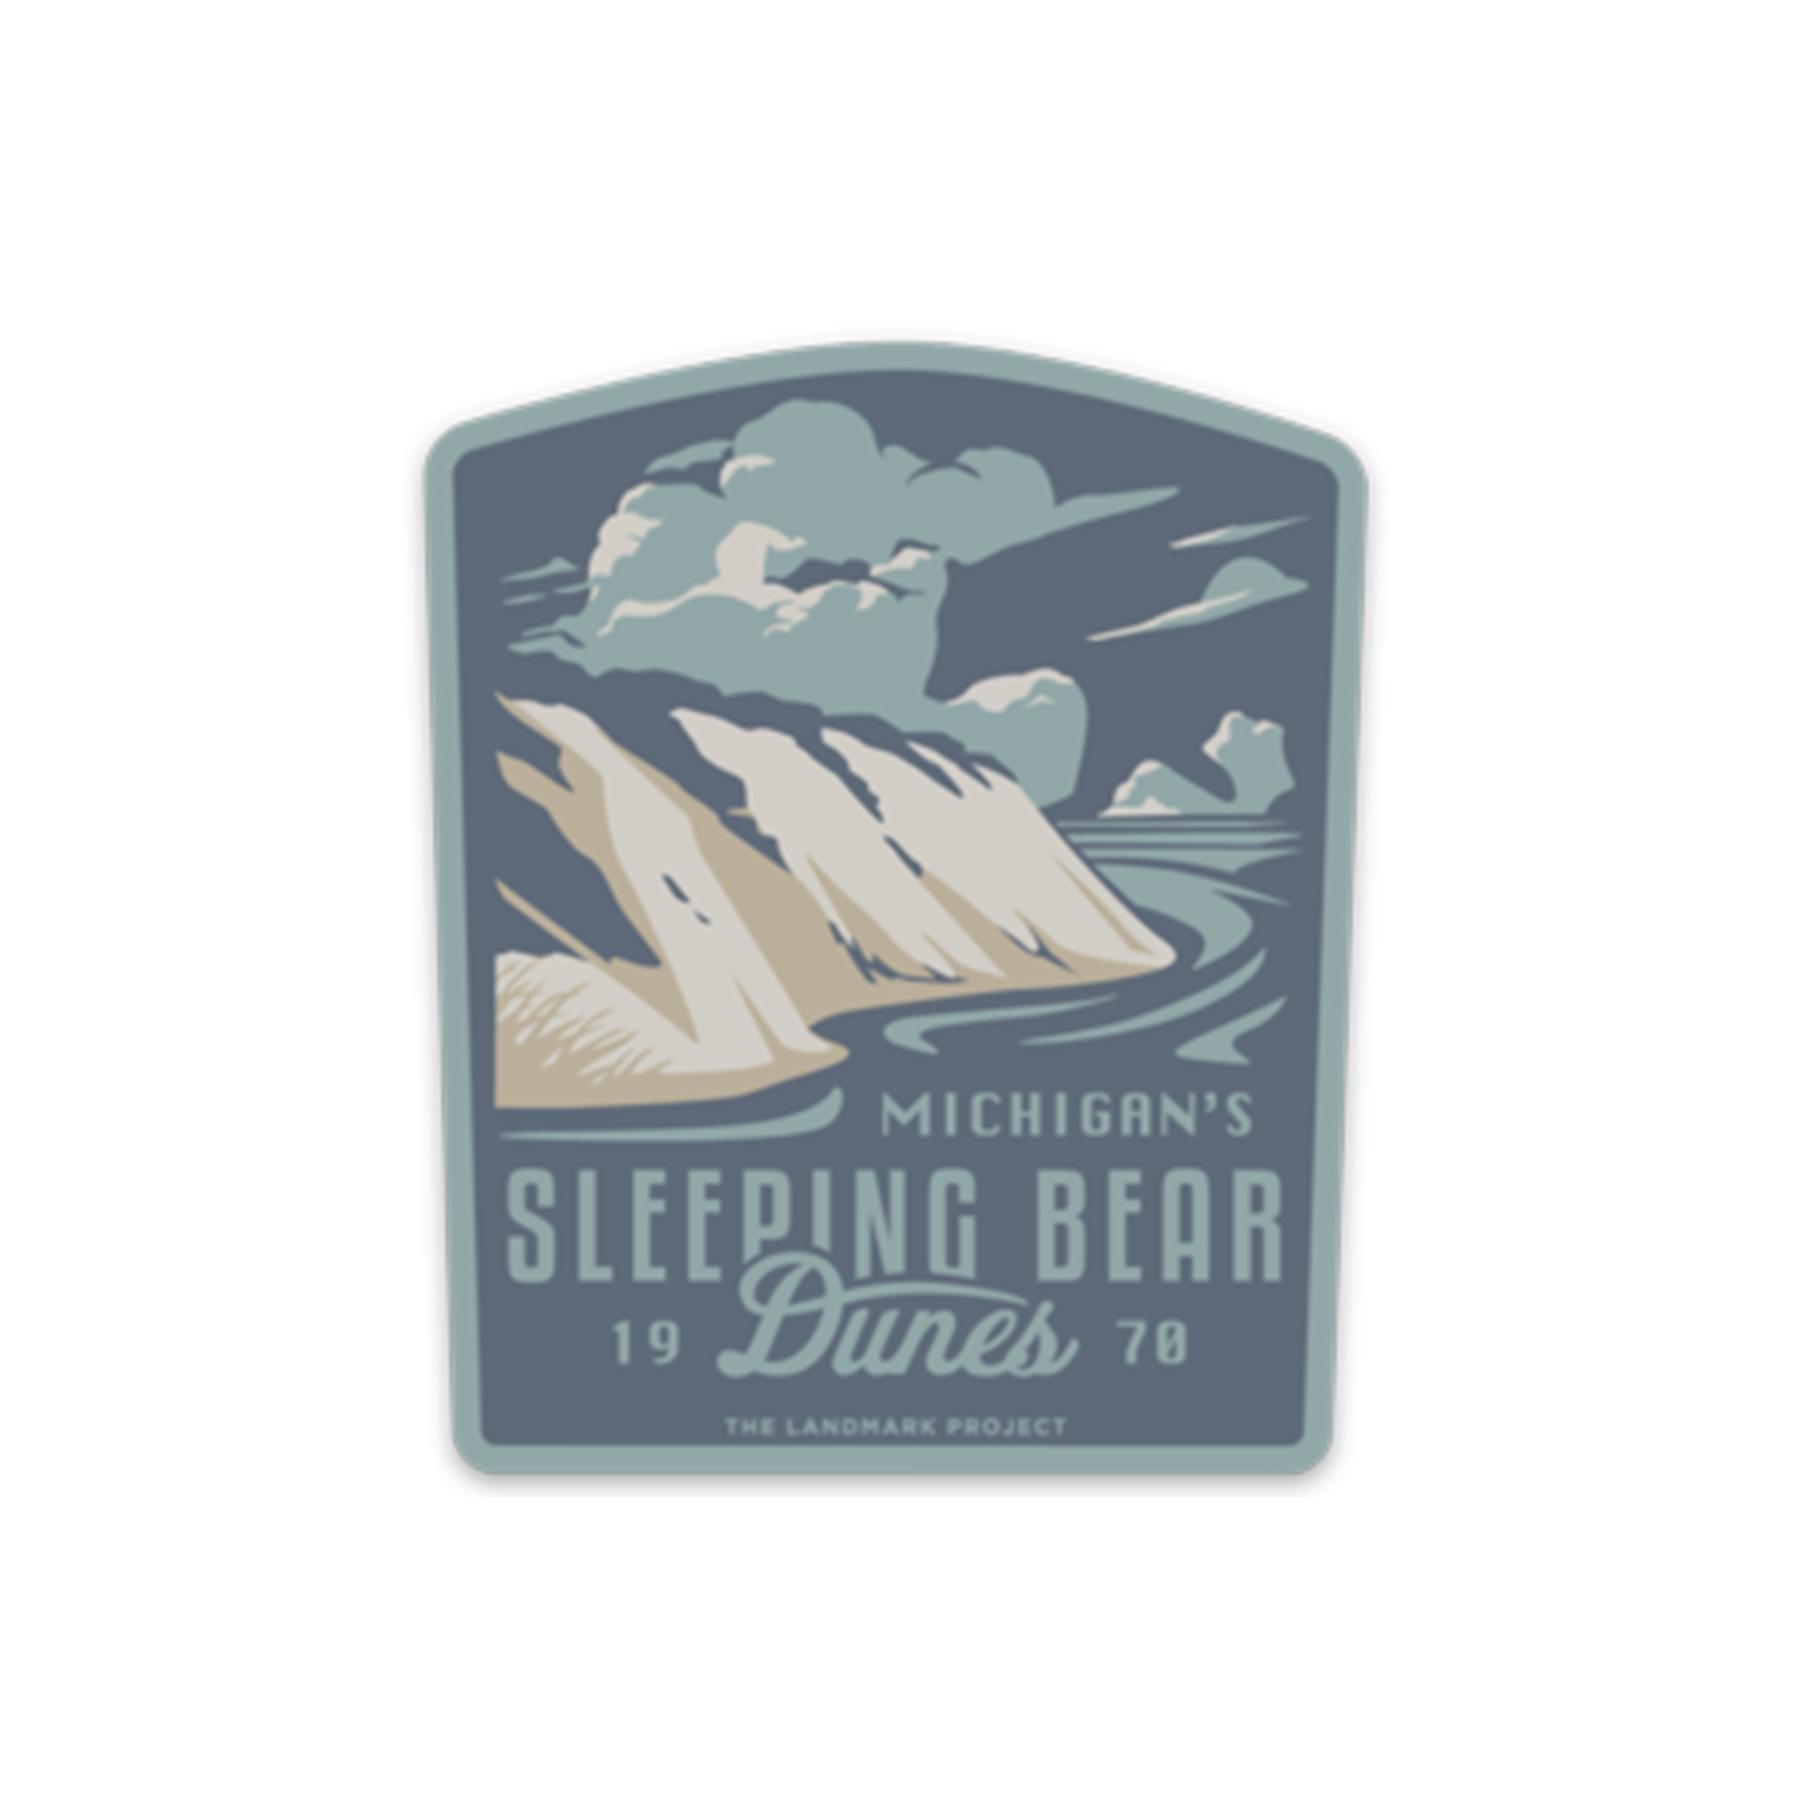 sleeping-bear-sticker.jpg